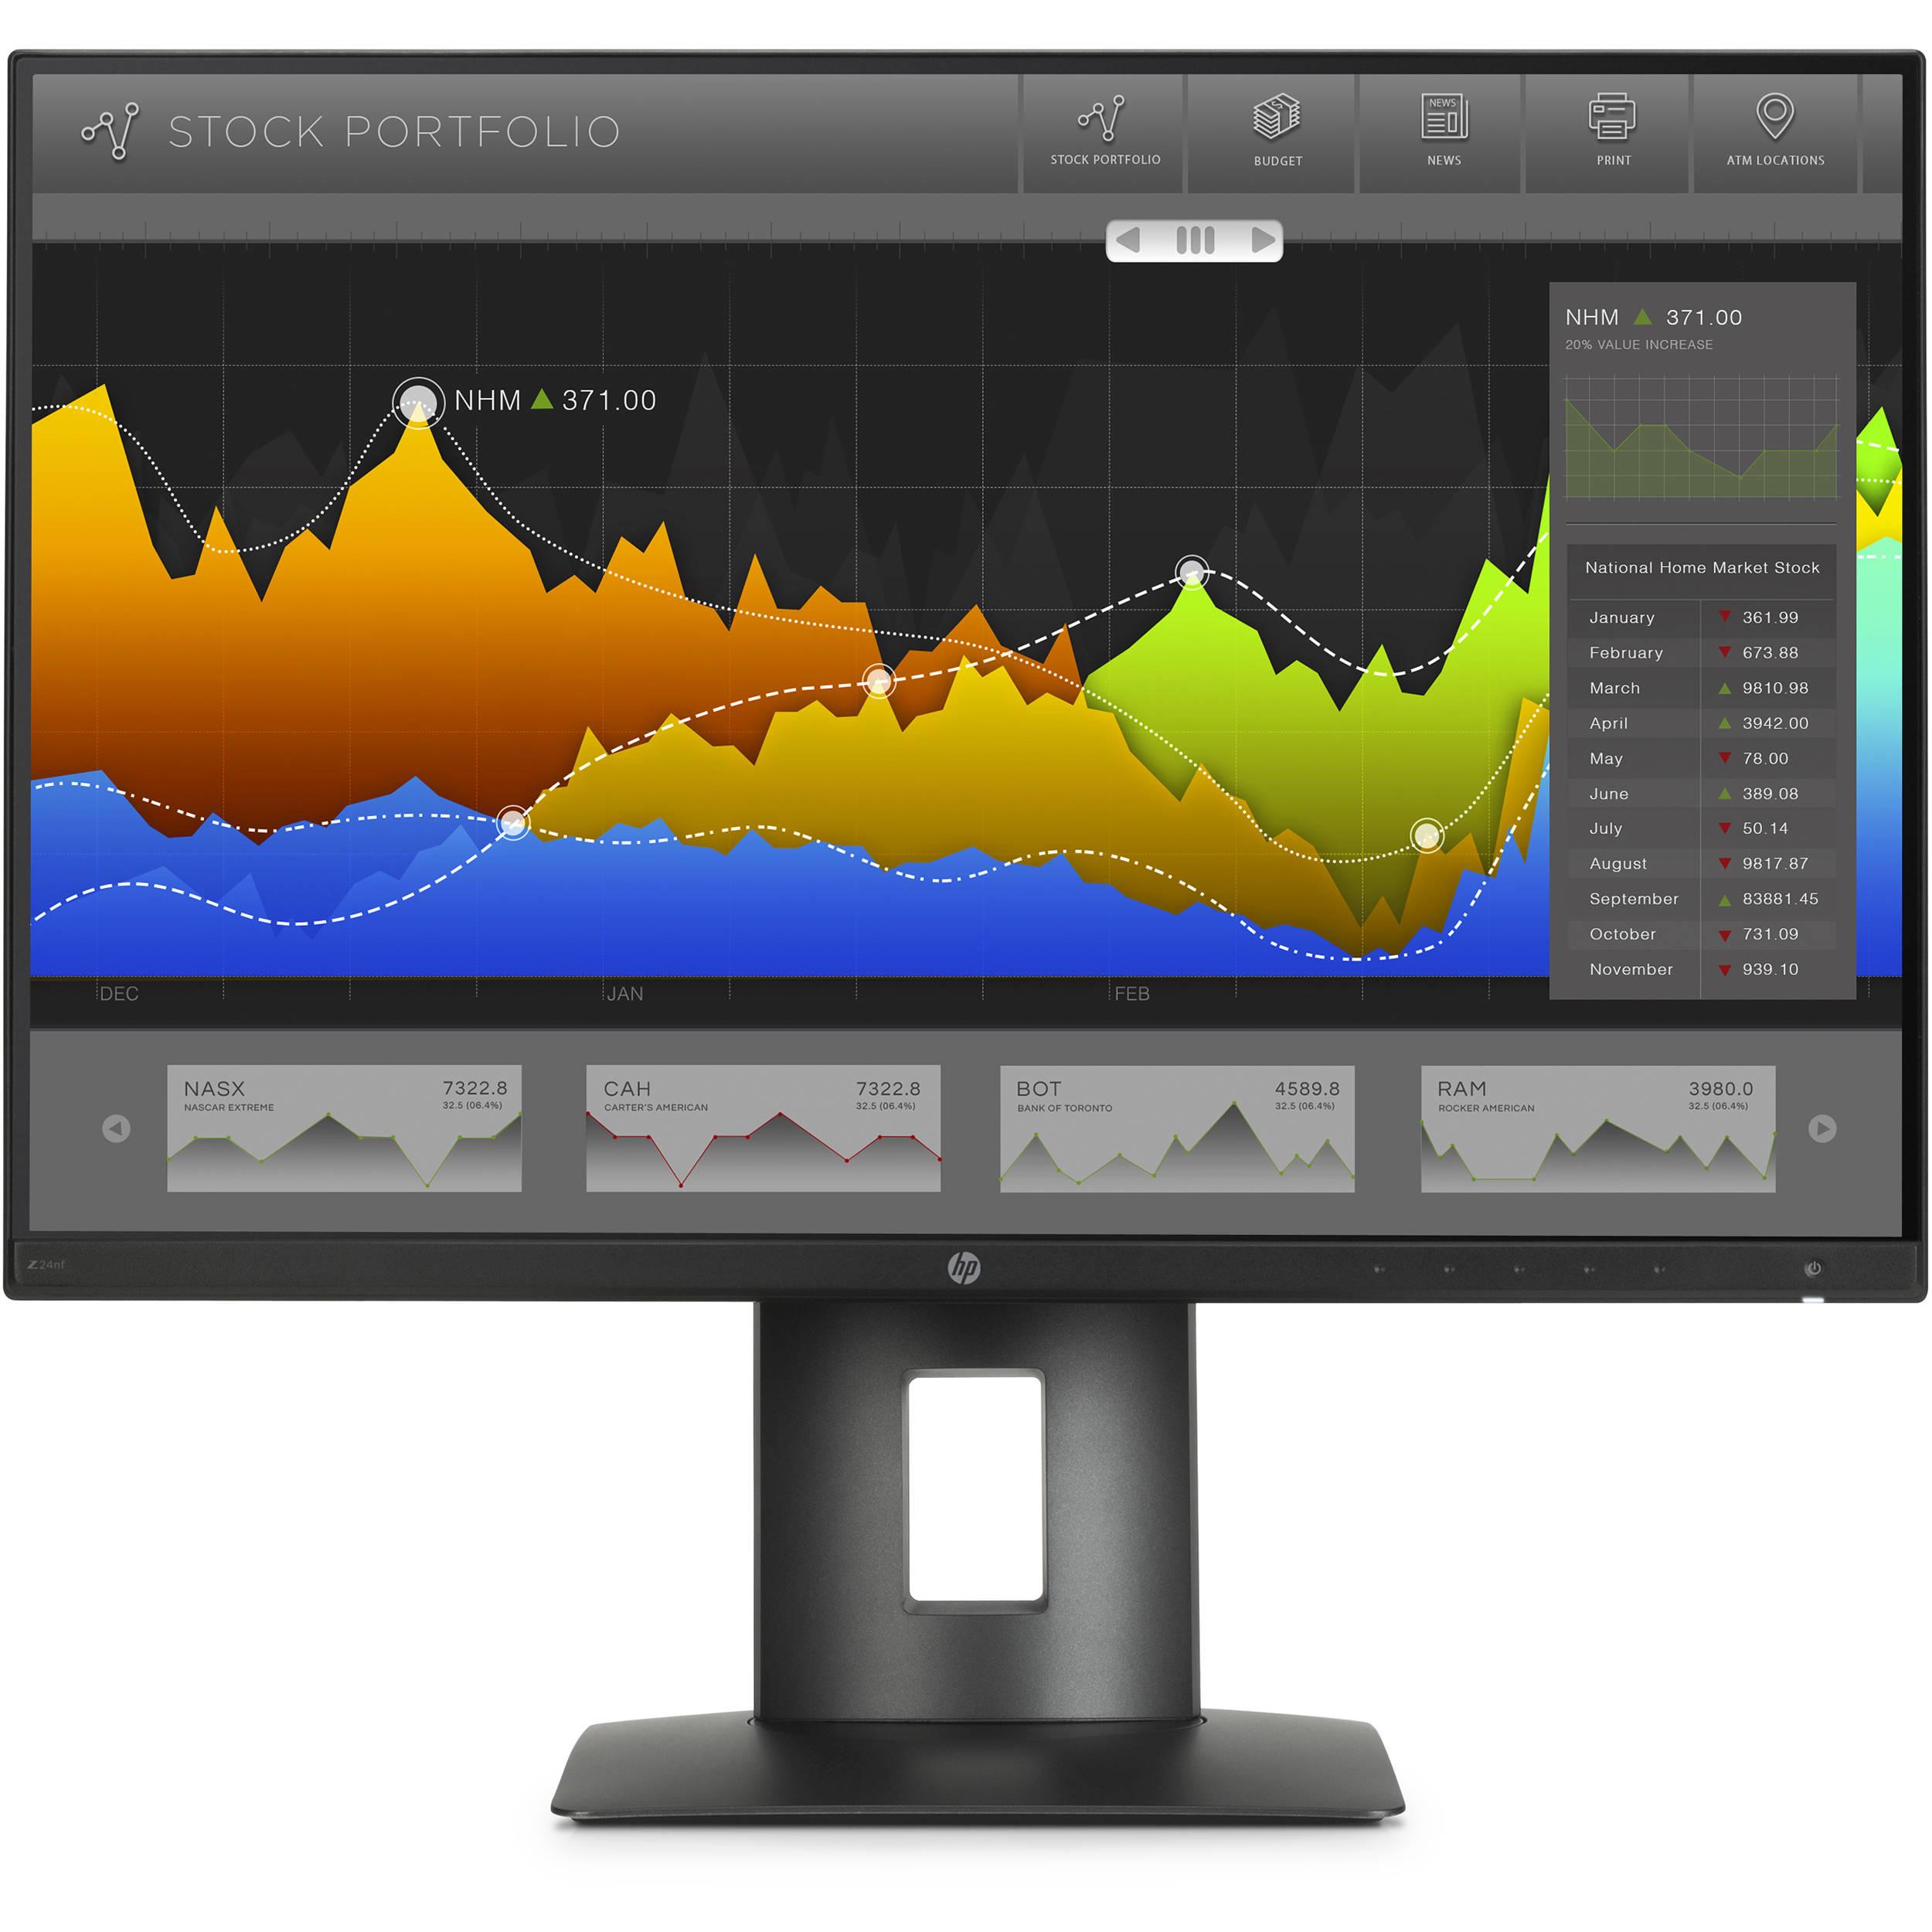 hp z24nf 23 8 16 9 narrow bezel ips monitor k7c00a8 aba. Black Bedroom Furniture Sets. Home Design Ideas